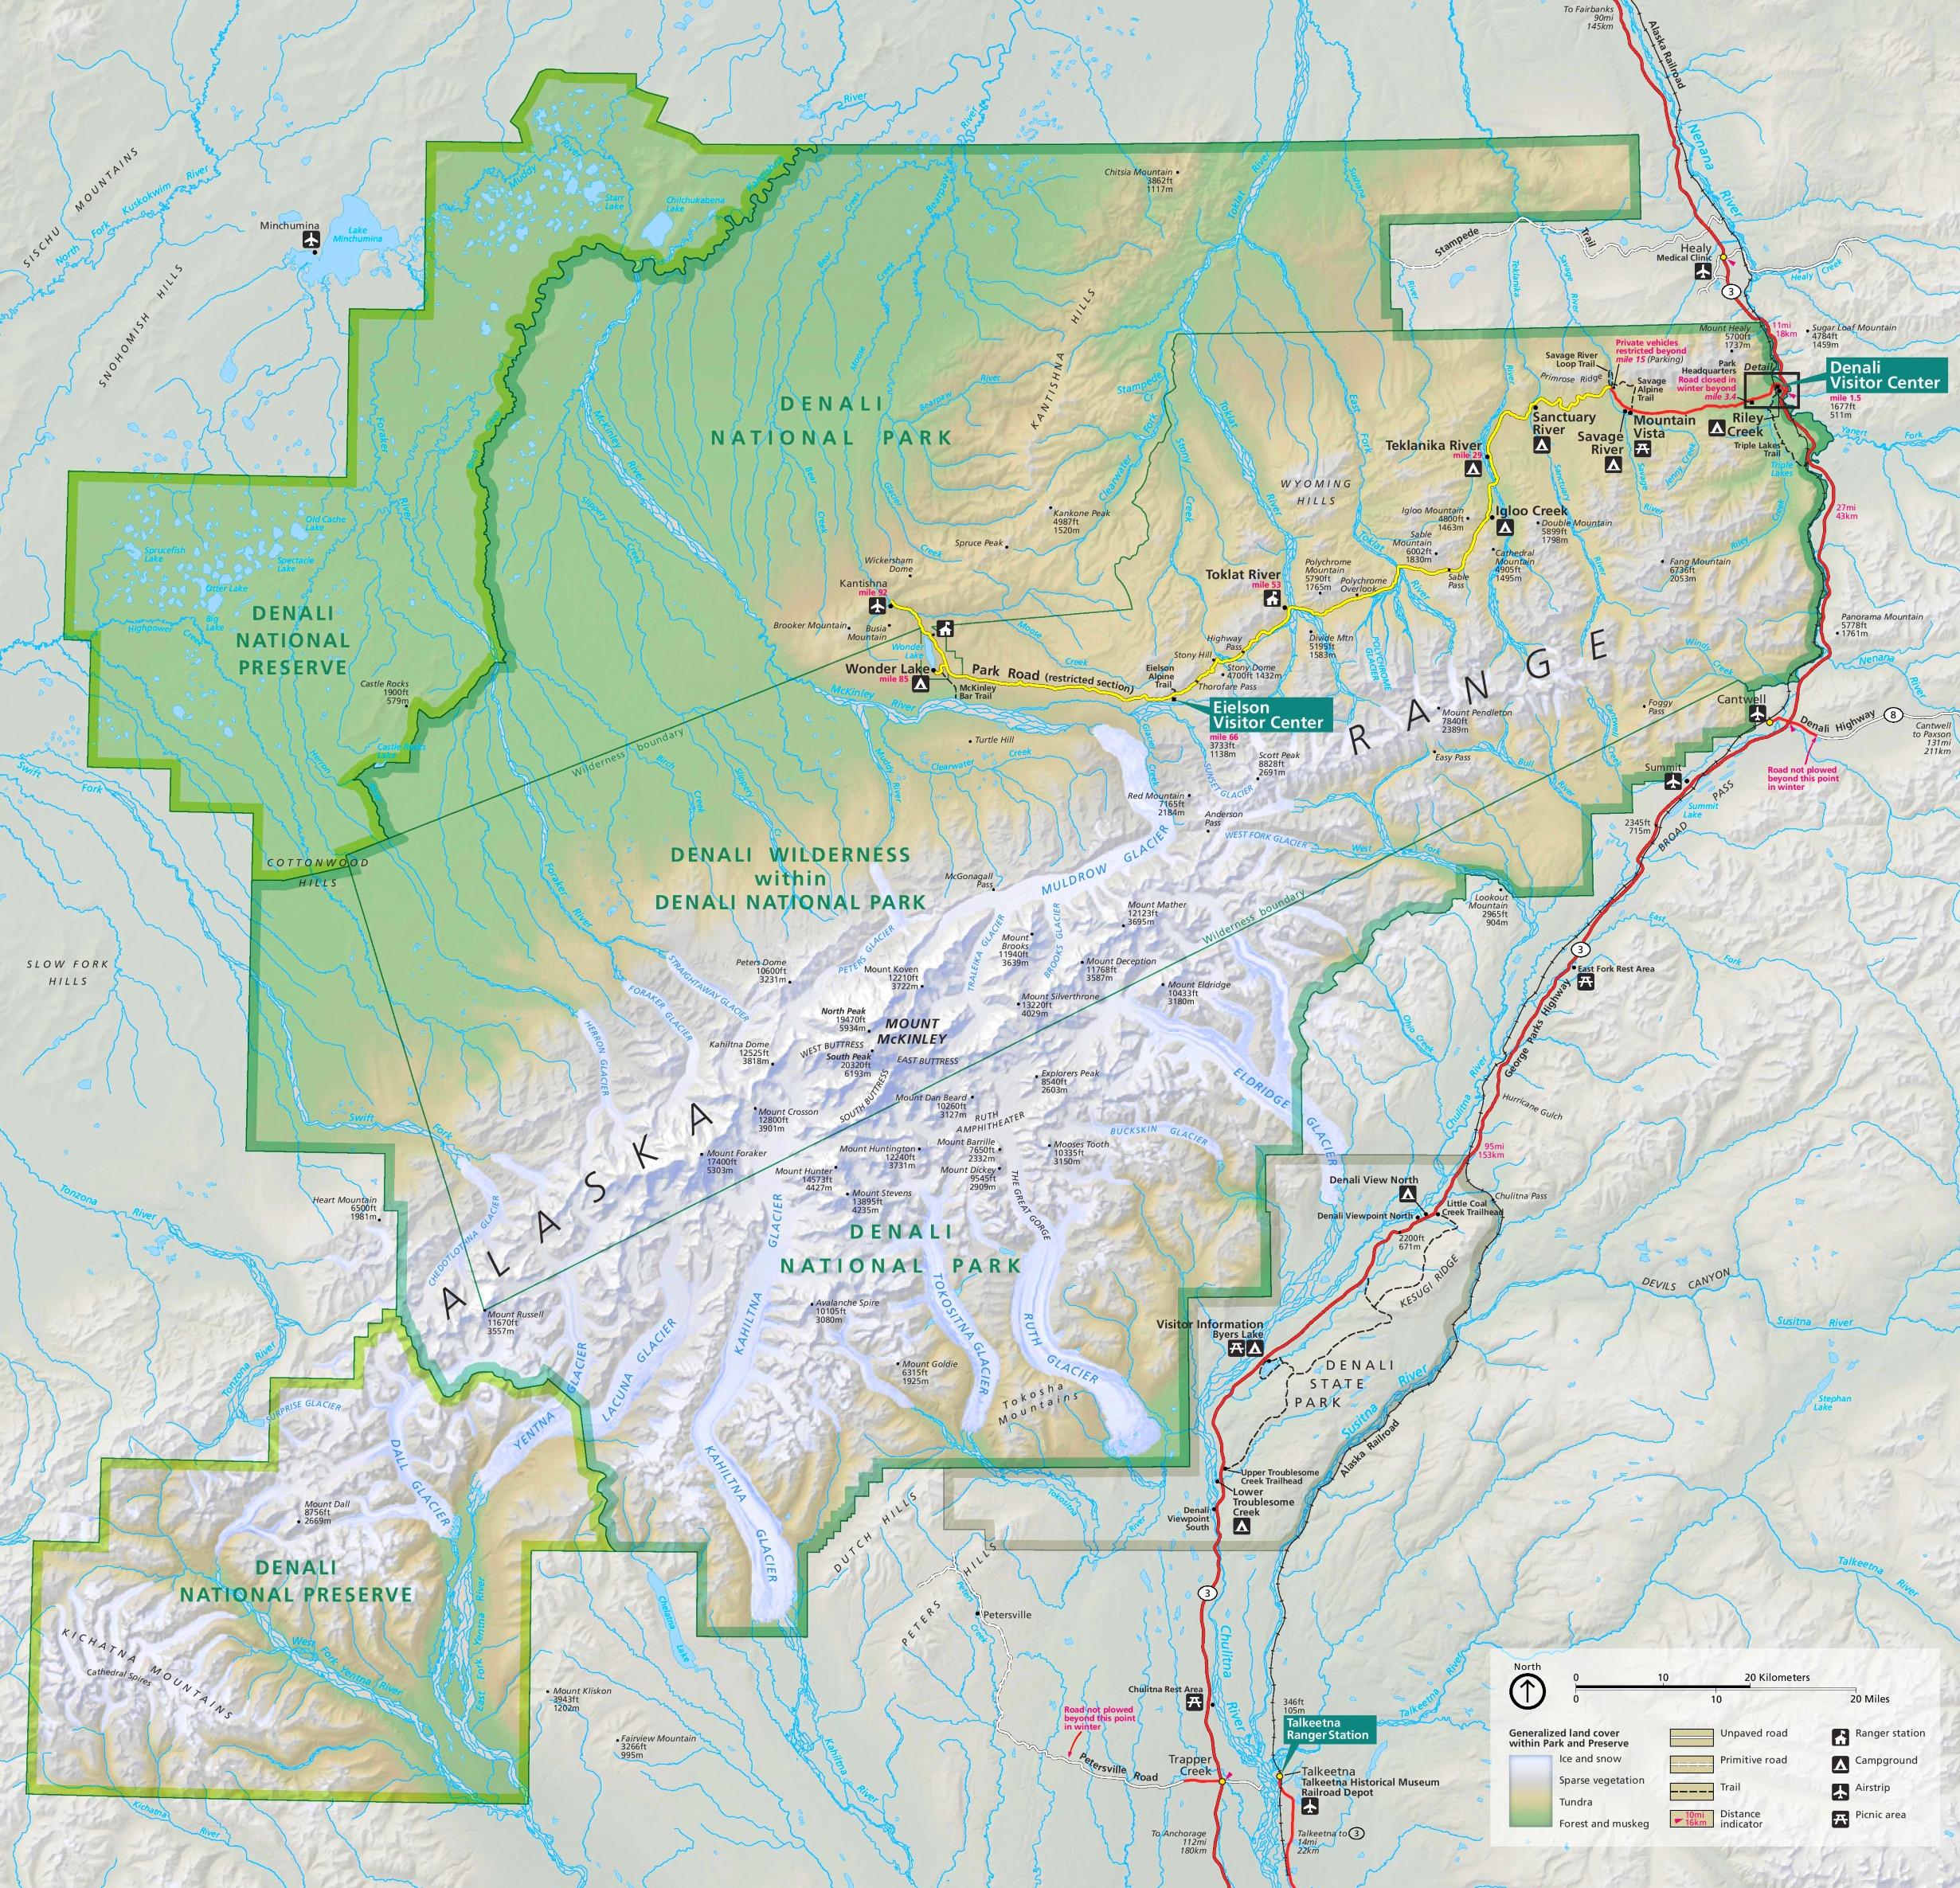 Denali National Park trail and camping map